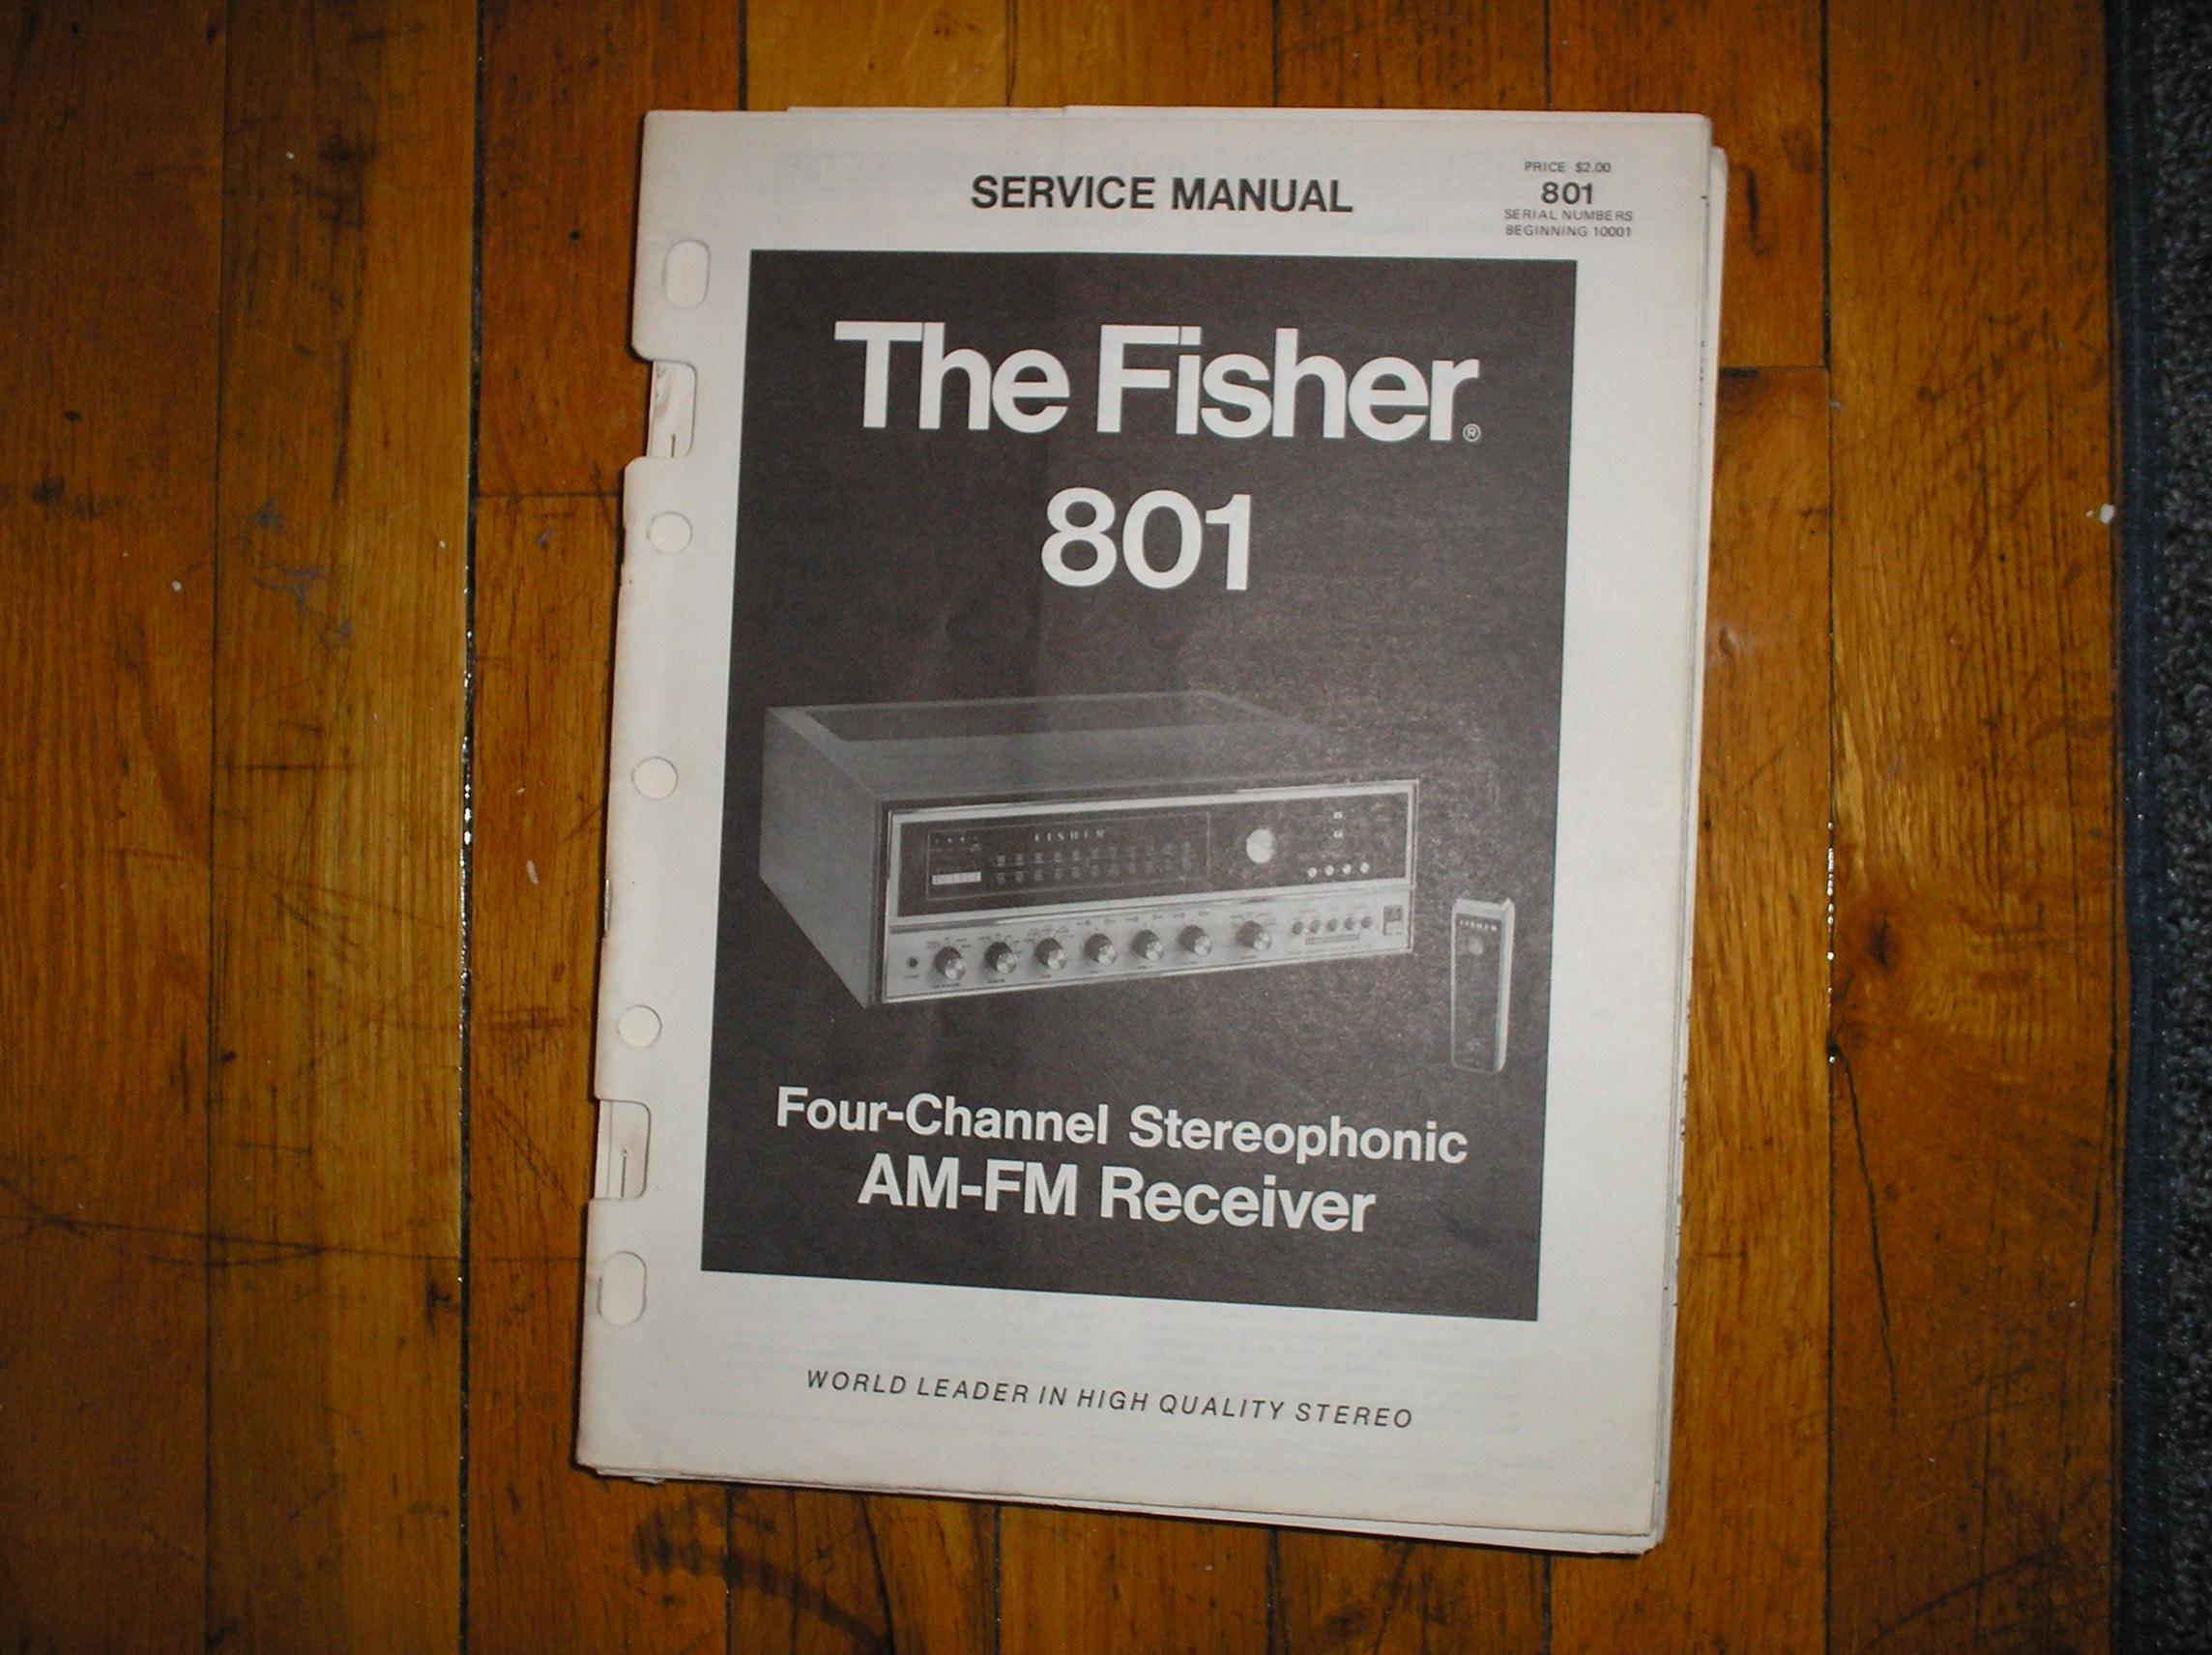 801 Receiver Service Manual